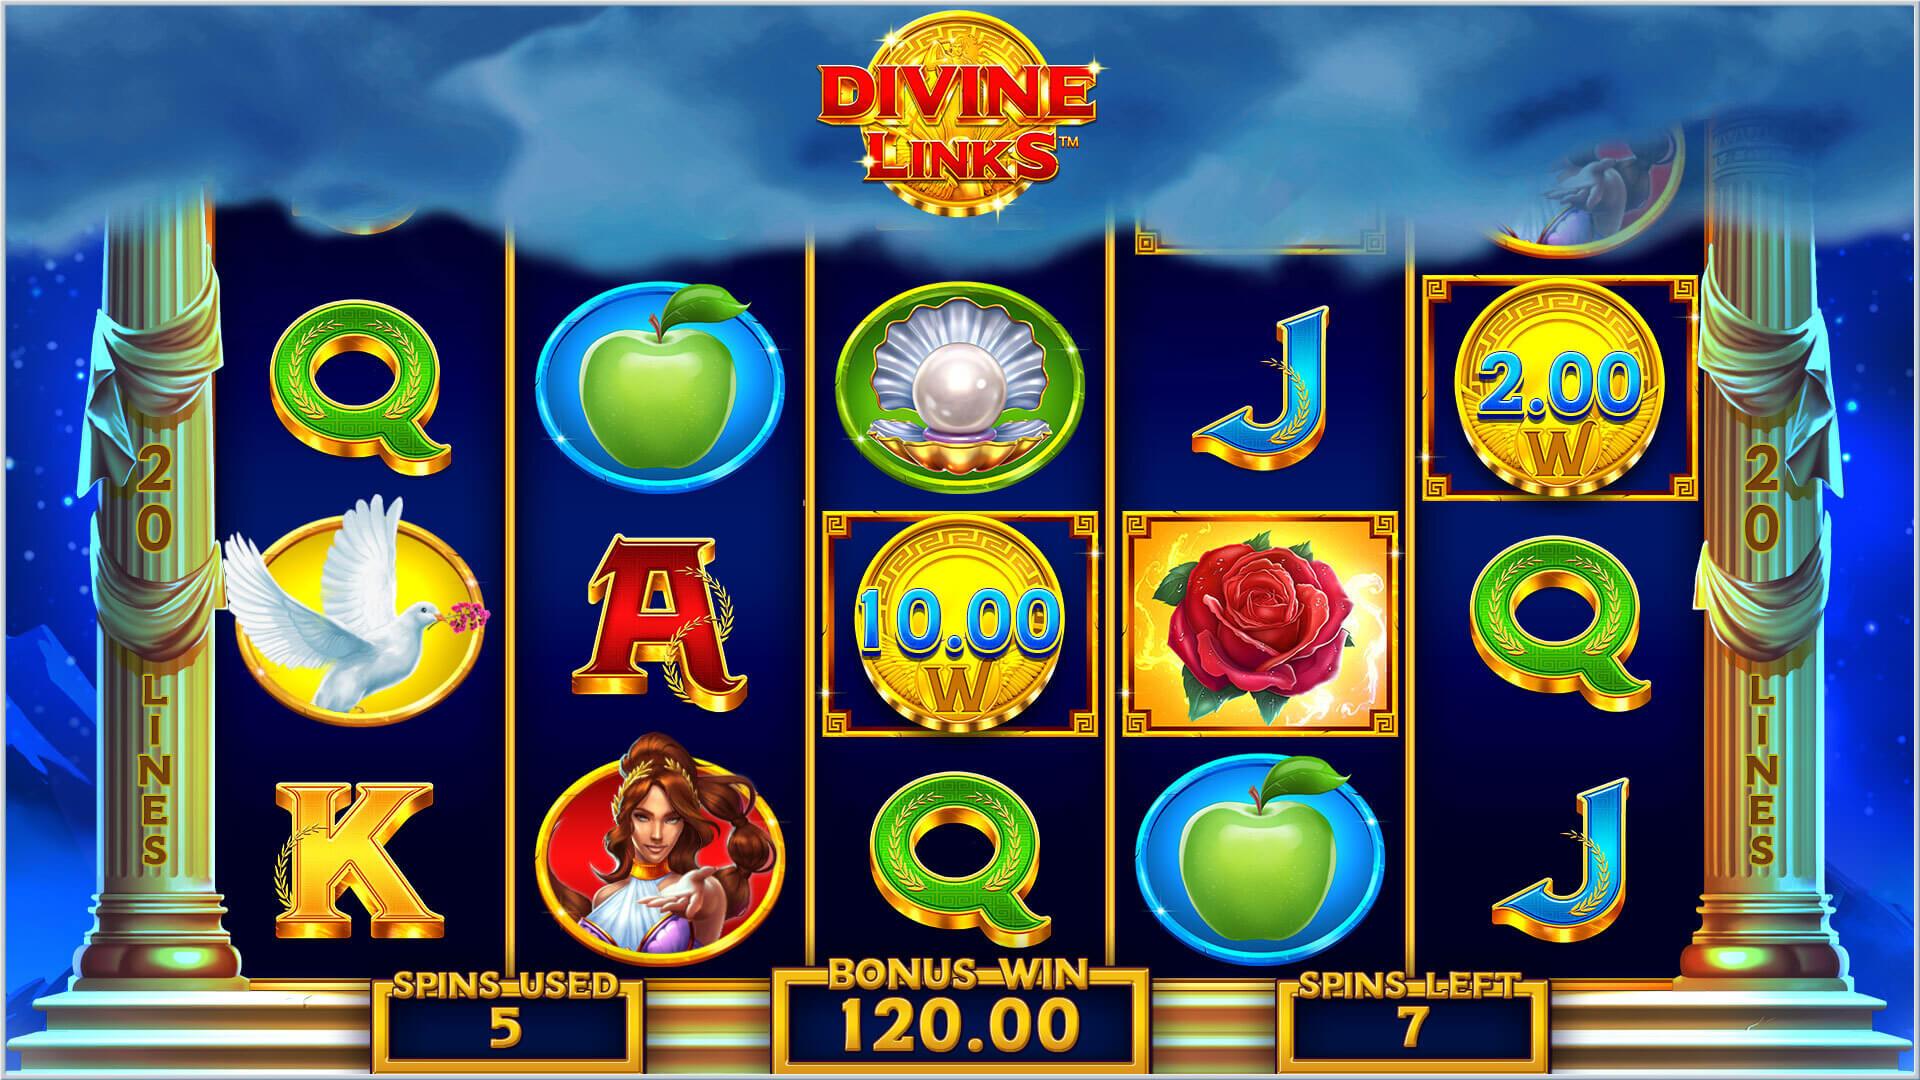 Divine Links 2